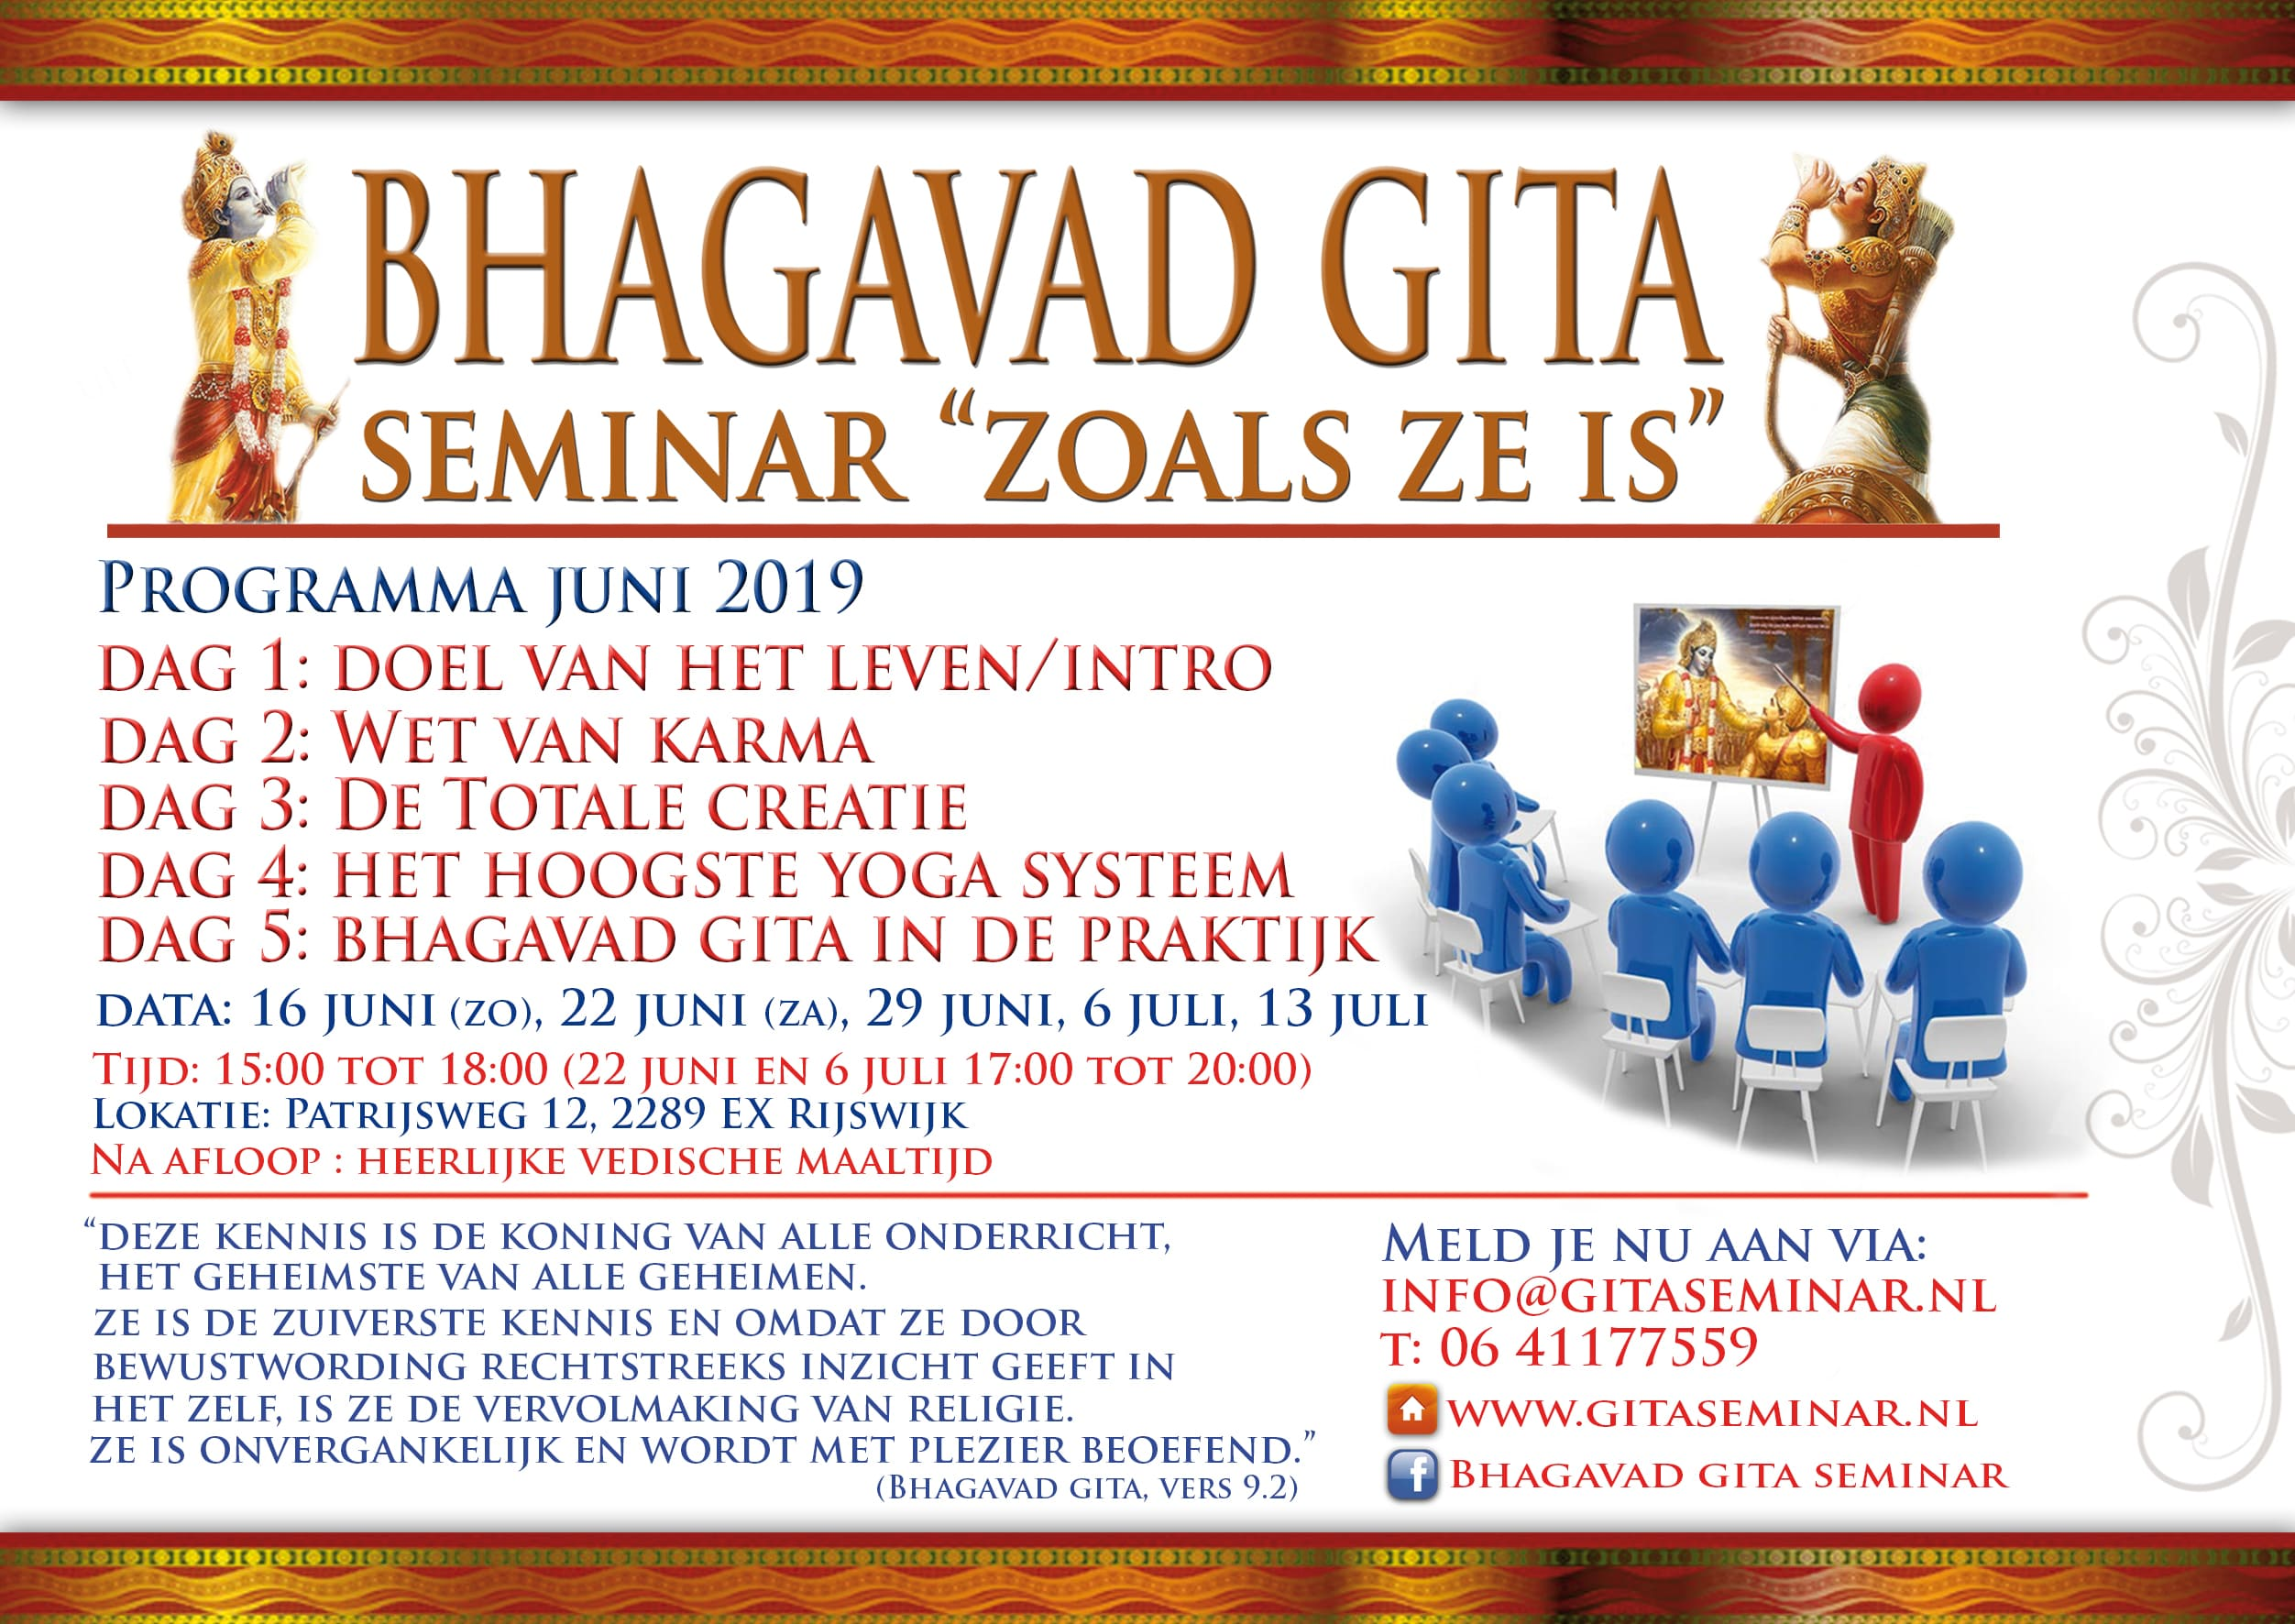 Bhagavad Gita Seminar Juni 2019